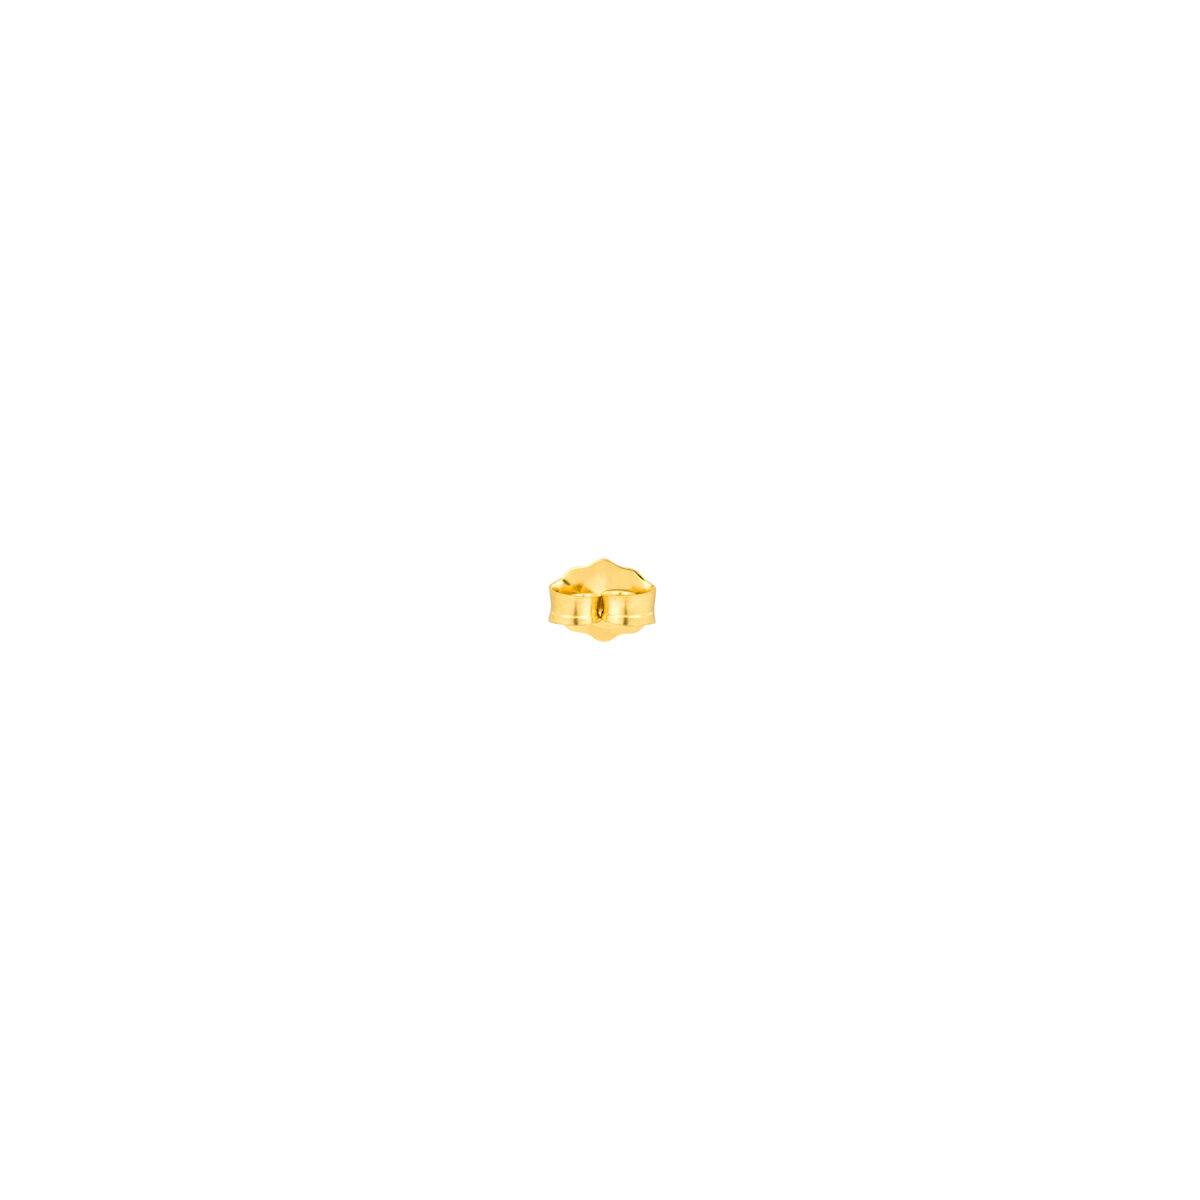 پشت گوشواره طلا تک لنگه ای